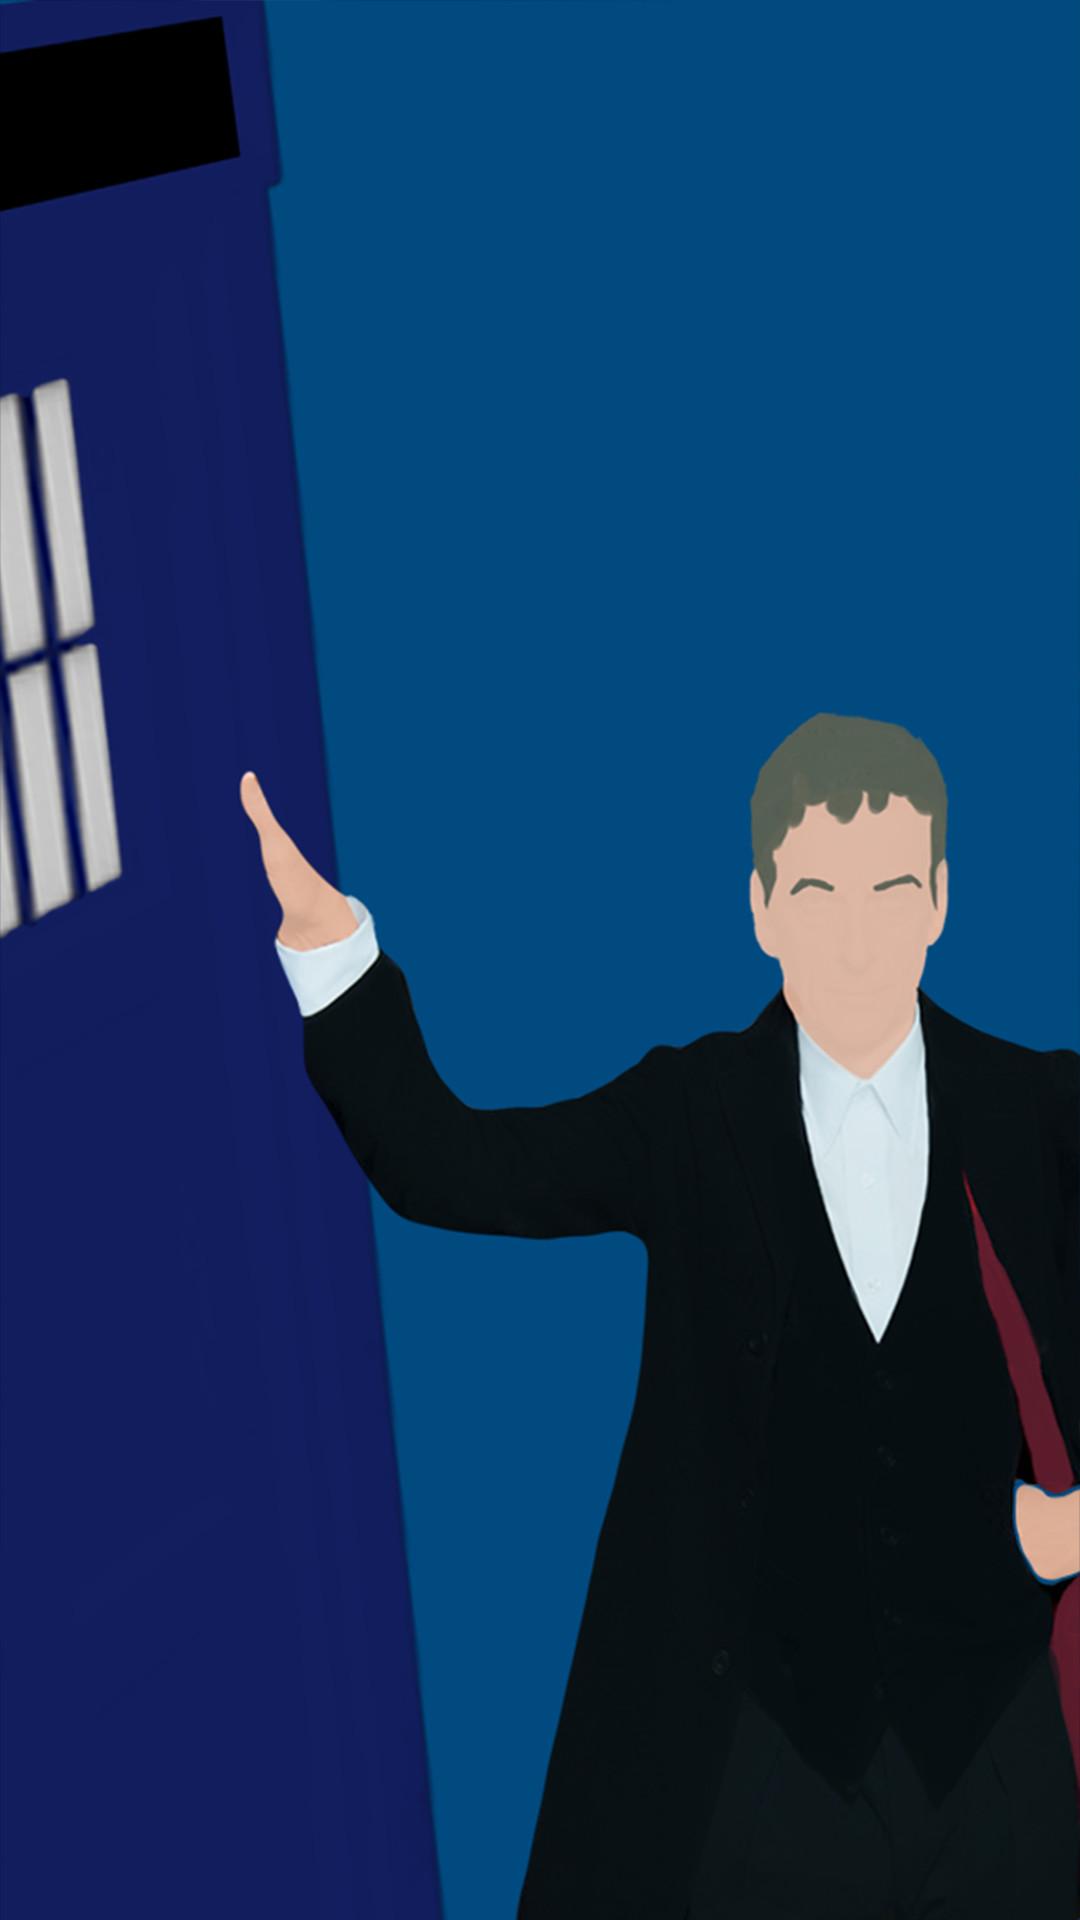 these minimalistic Season 8 Doctor Who wallpapers! | yBaX |> START .